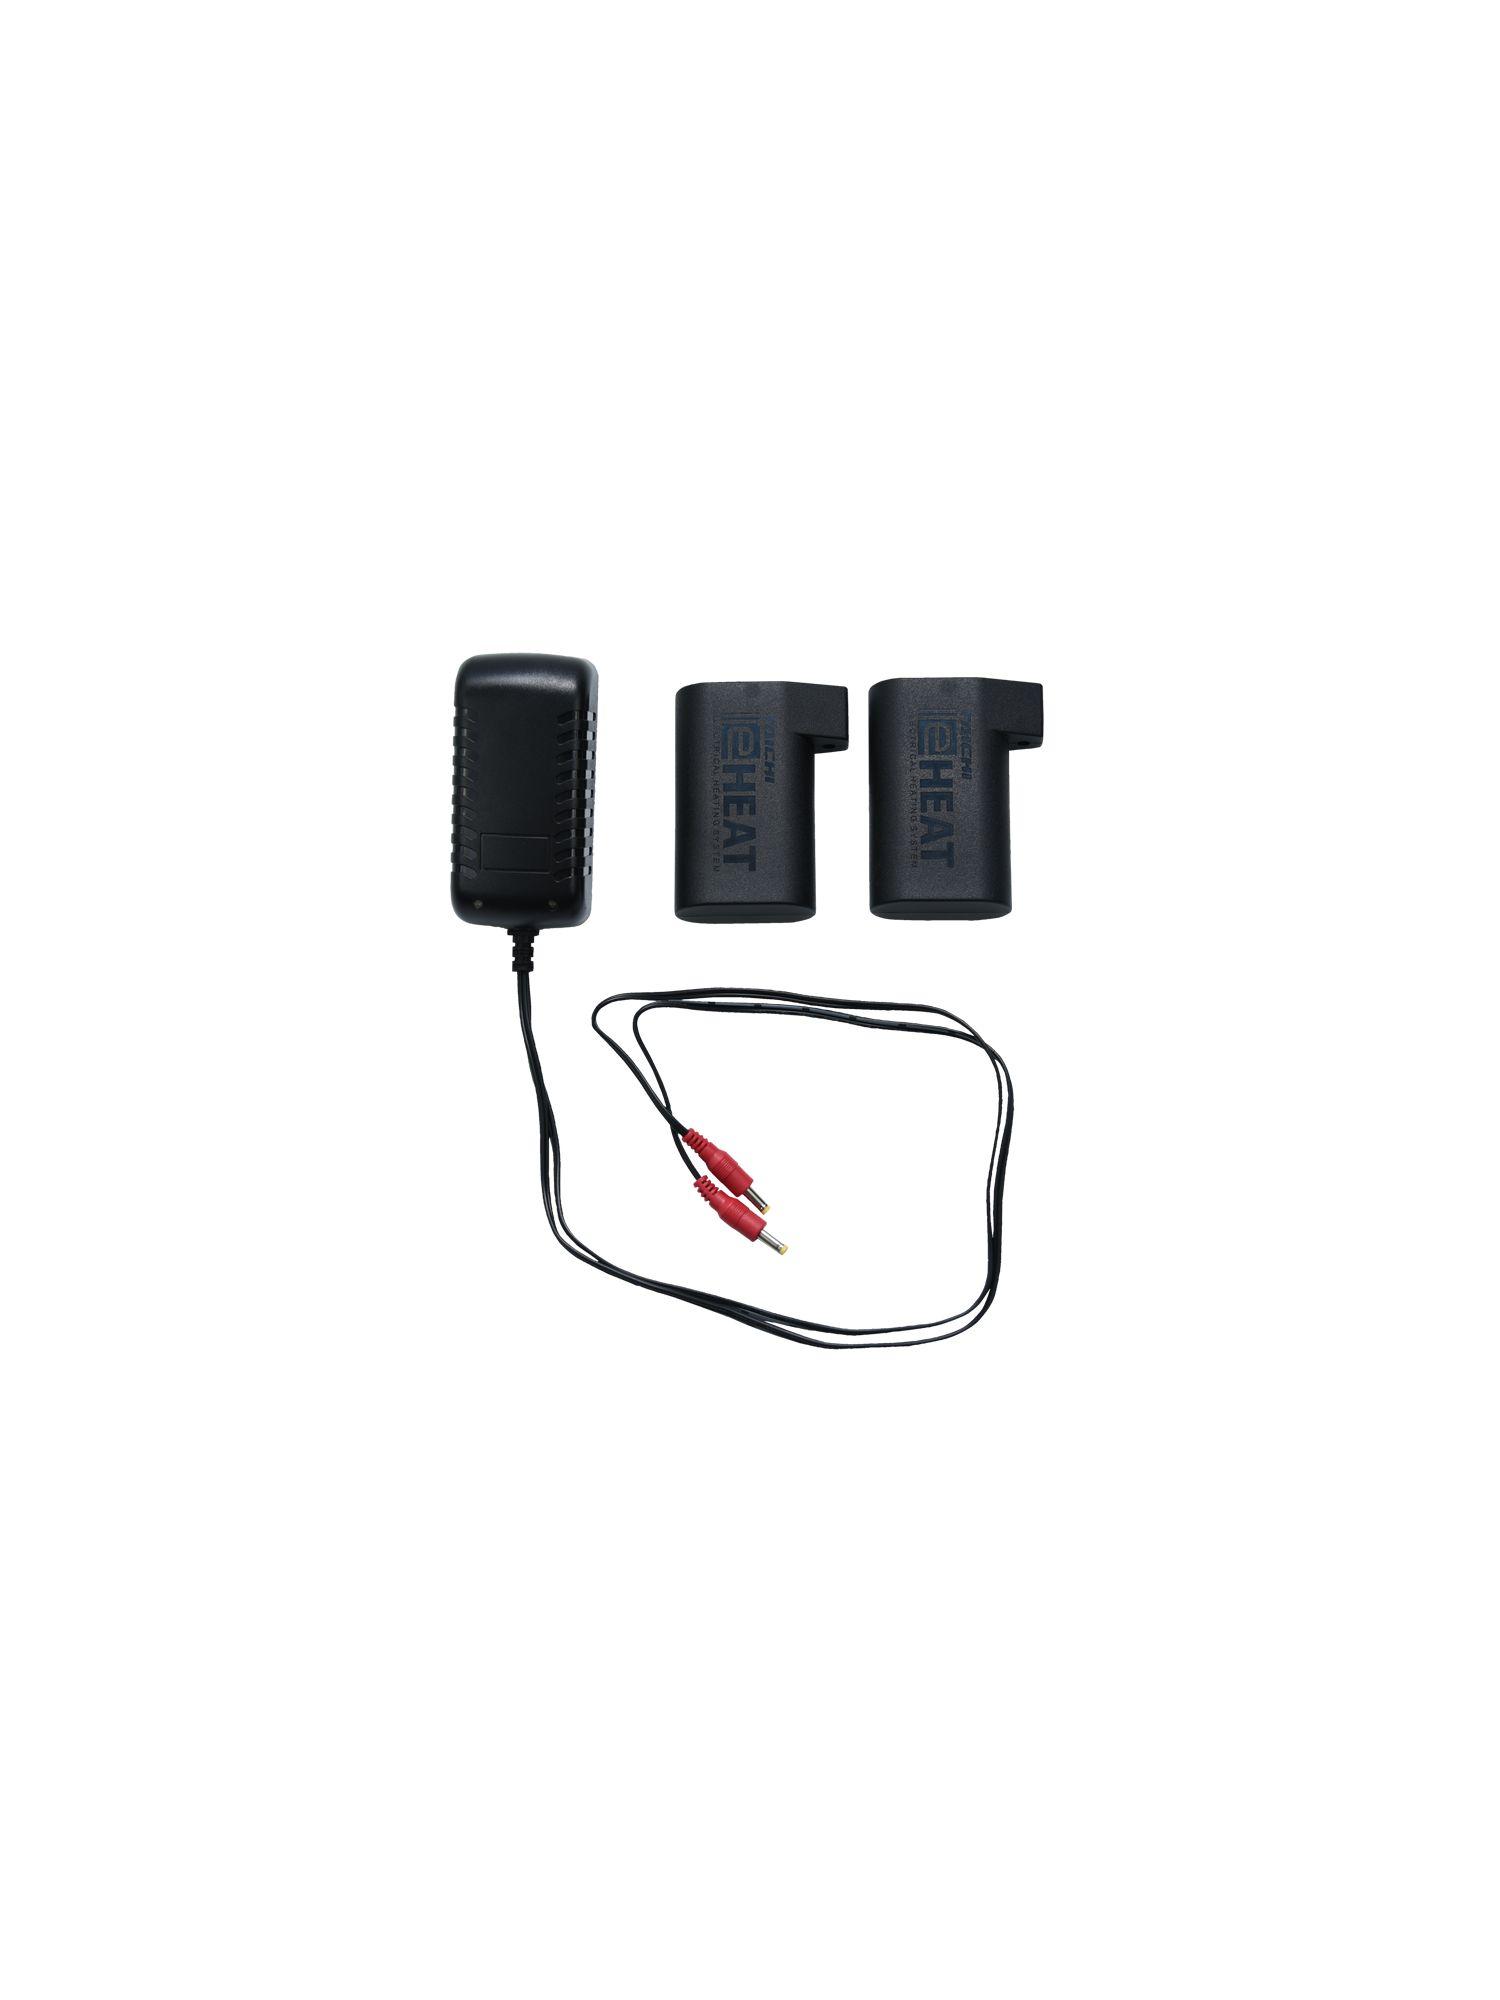 RSP057 | e-HEAT 7.2V充電器&バッテリーセット